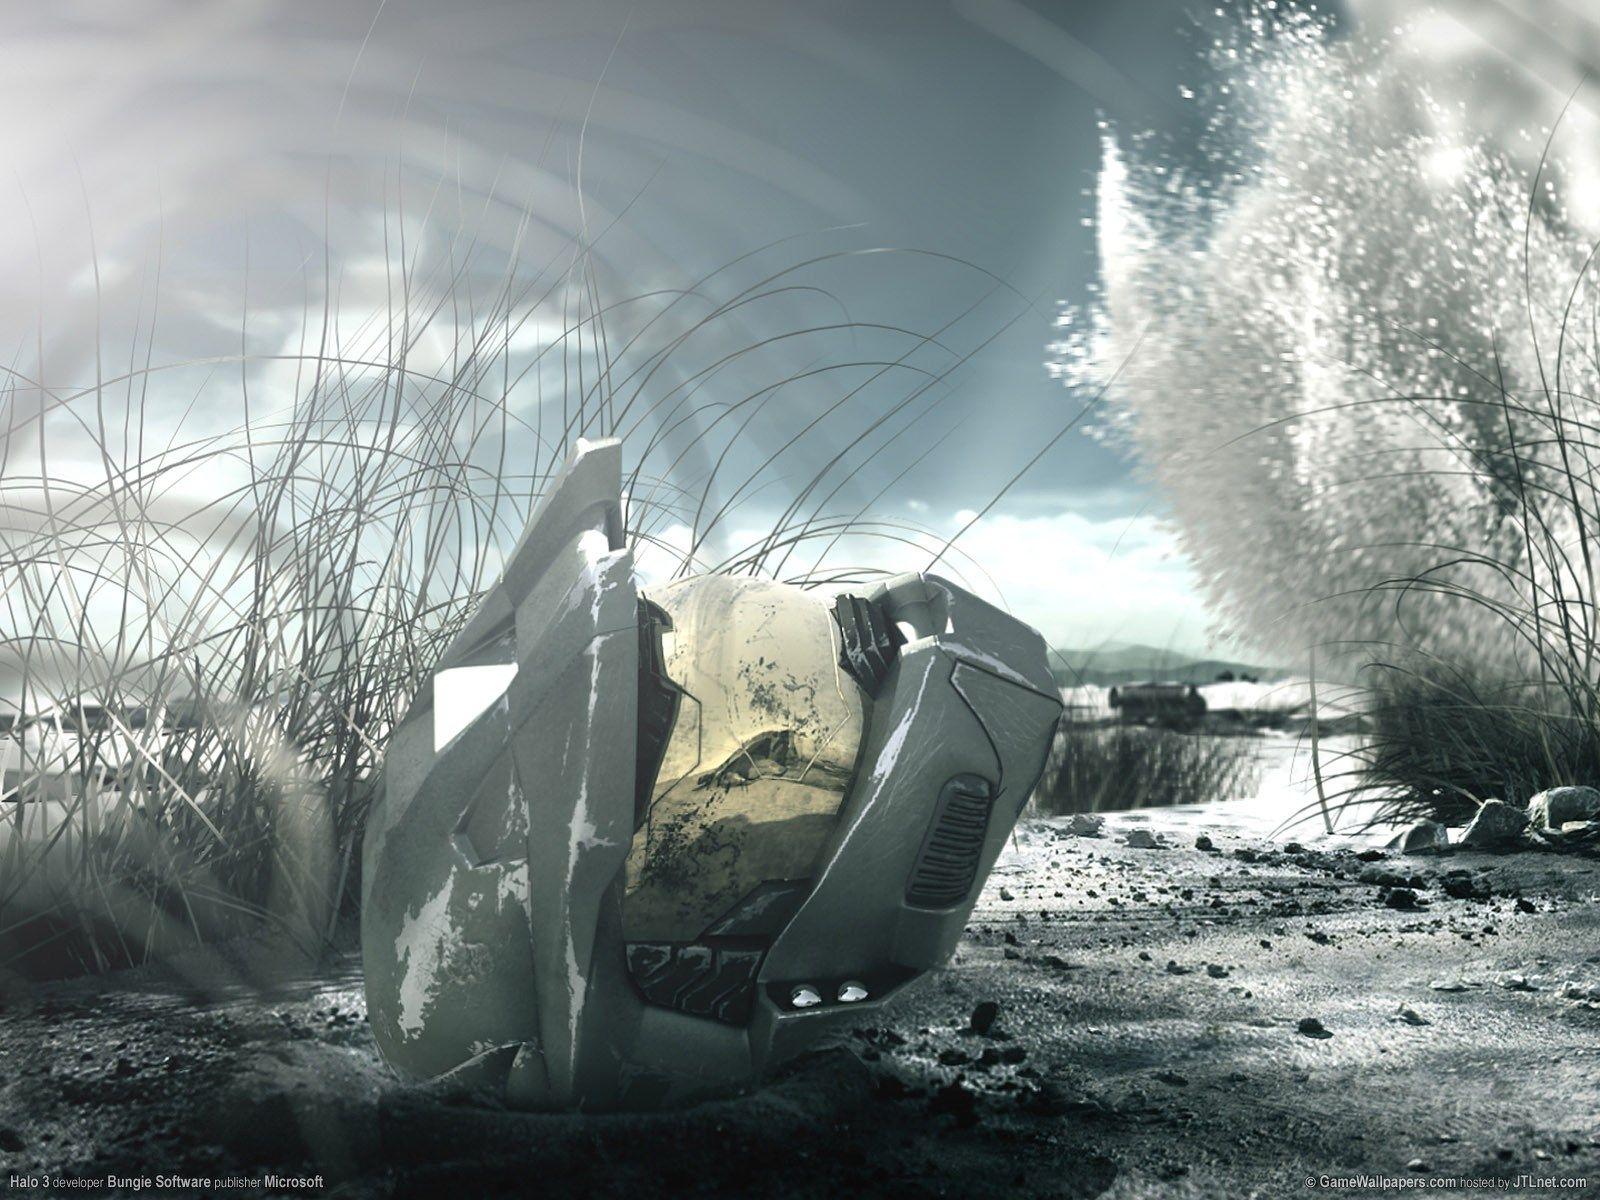 Halo 3 Trailer Pic Game Artspiration Halo Fondos De